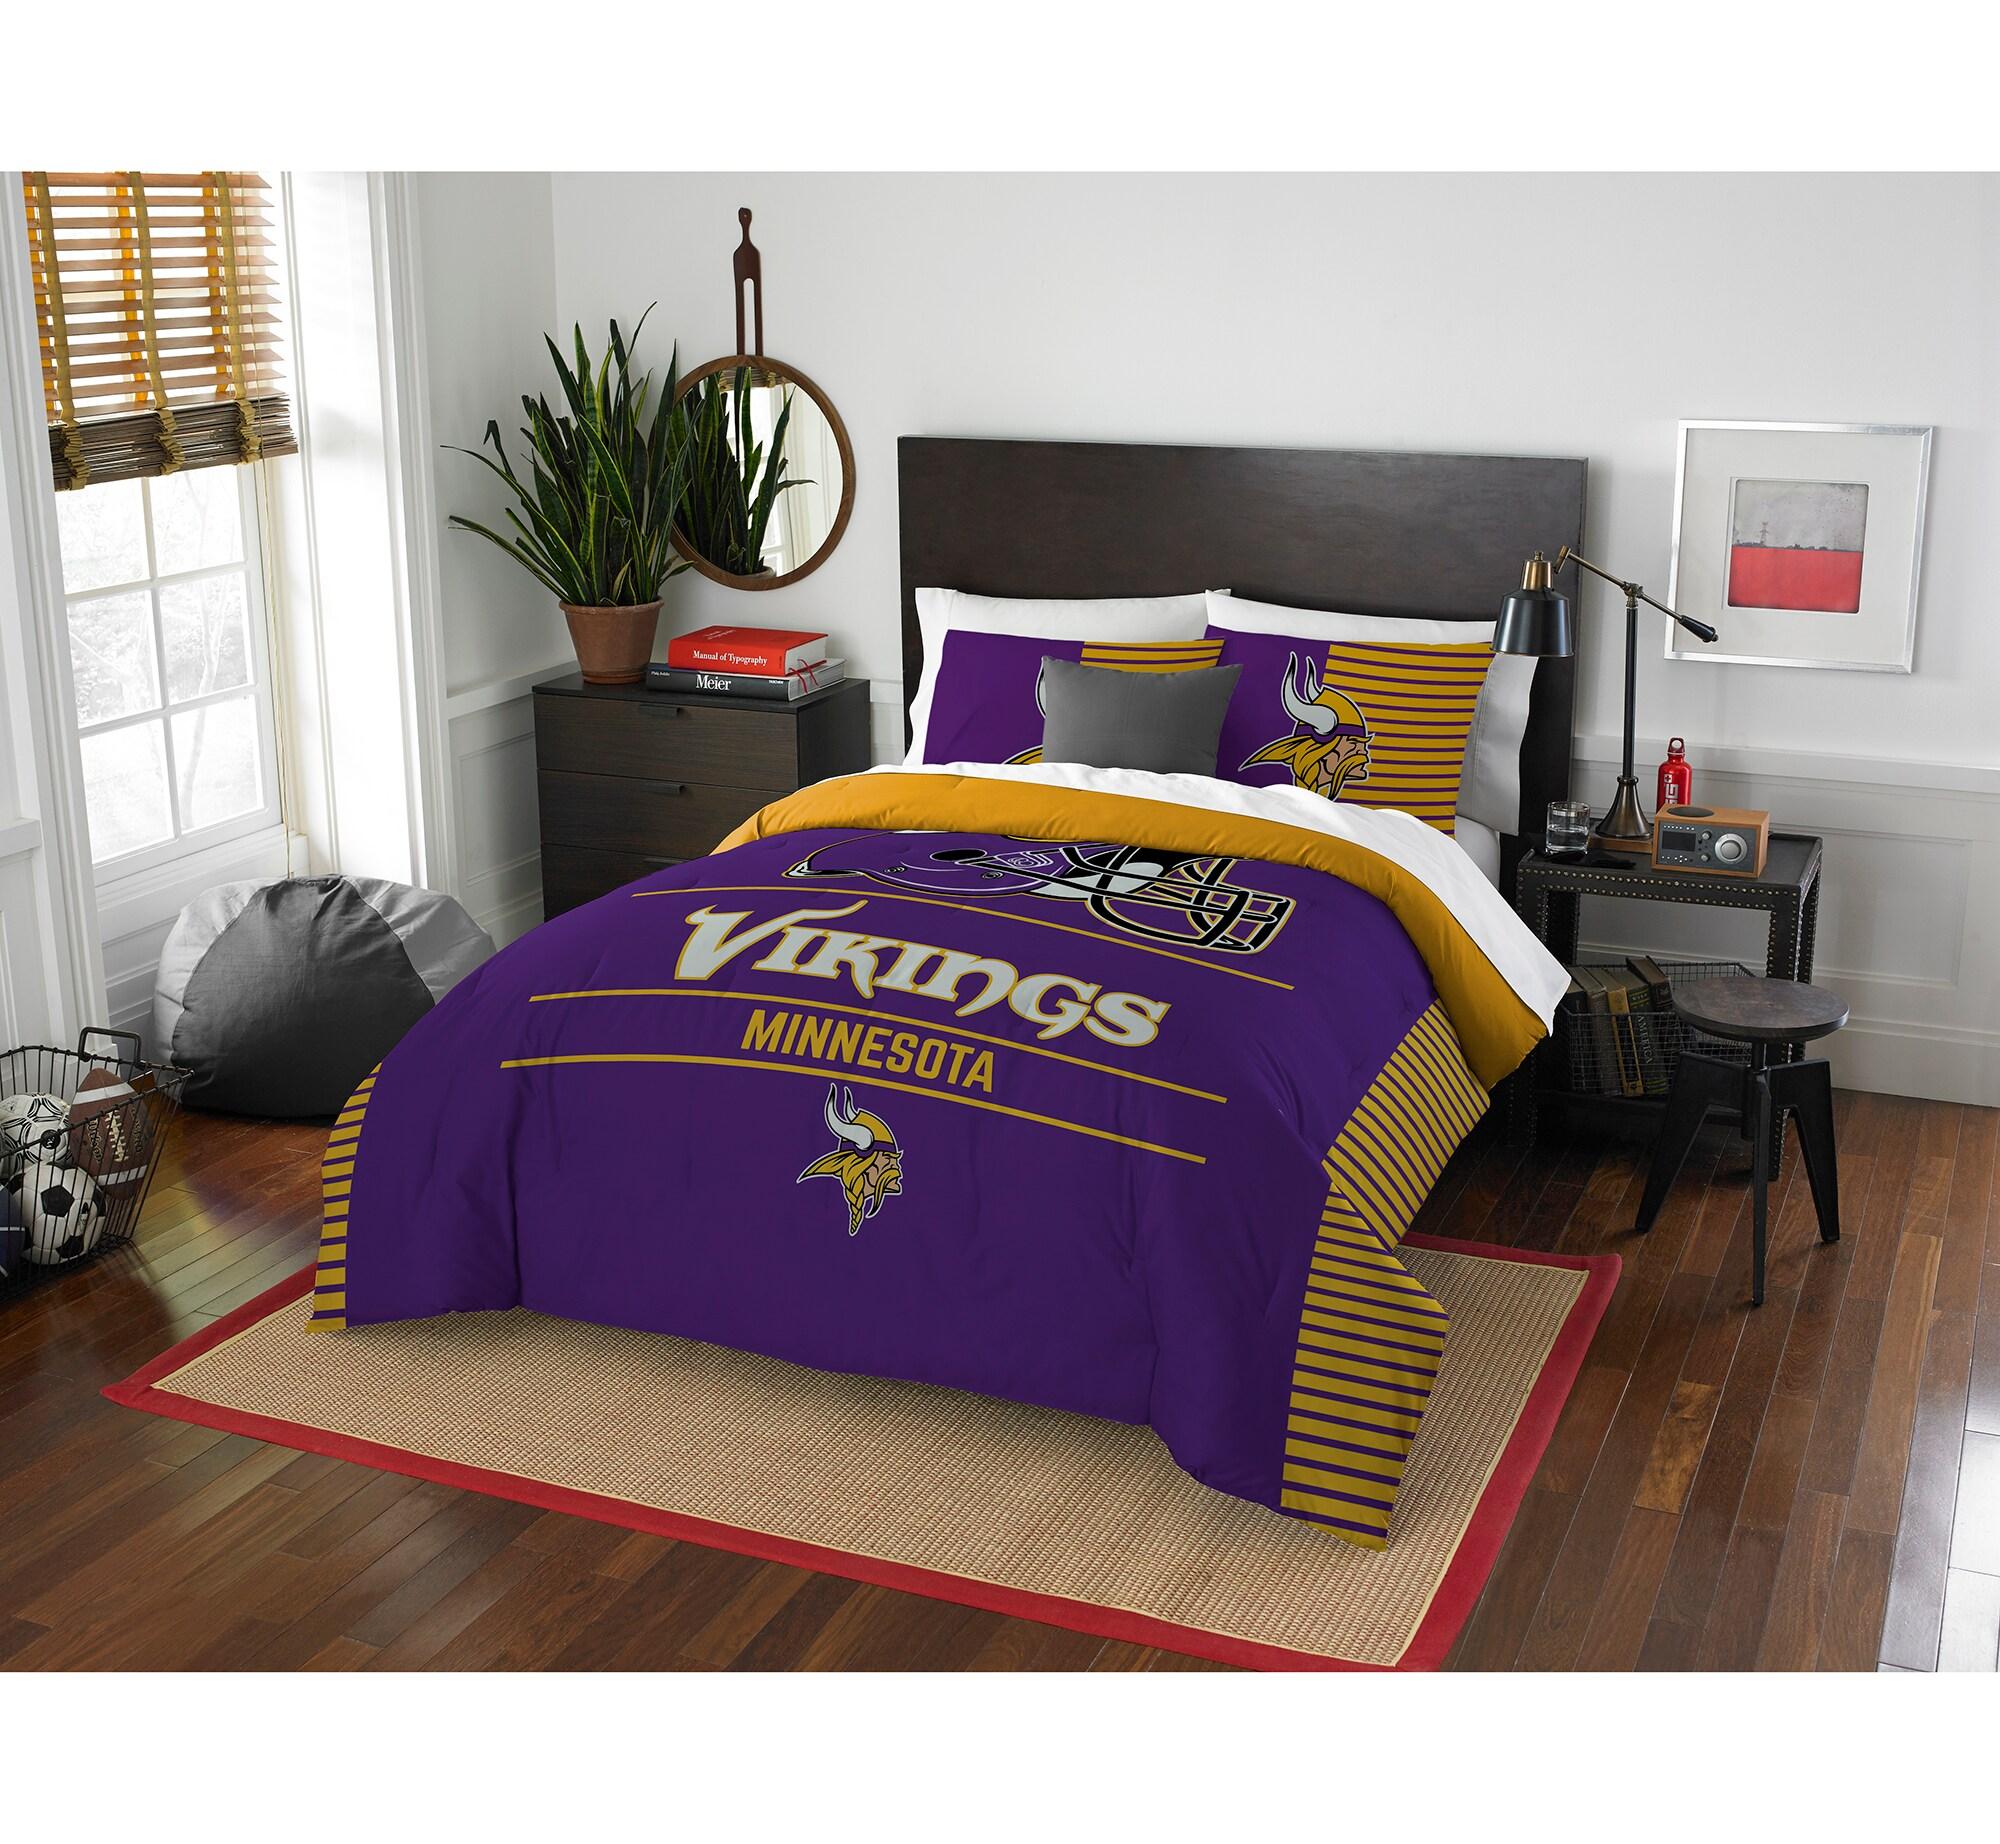 Minnesota Vikings The Northwest Company NFL Draft Full/Queen Comforter Set